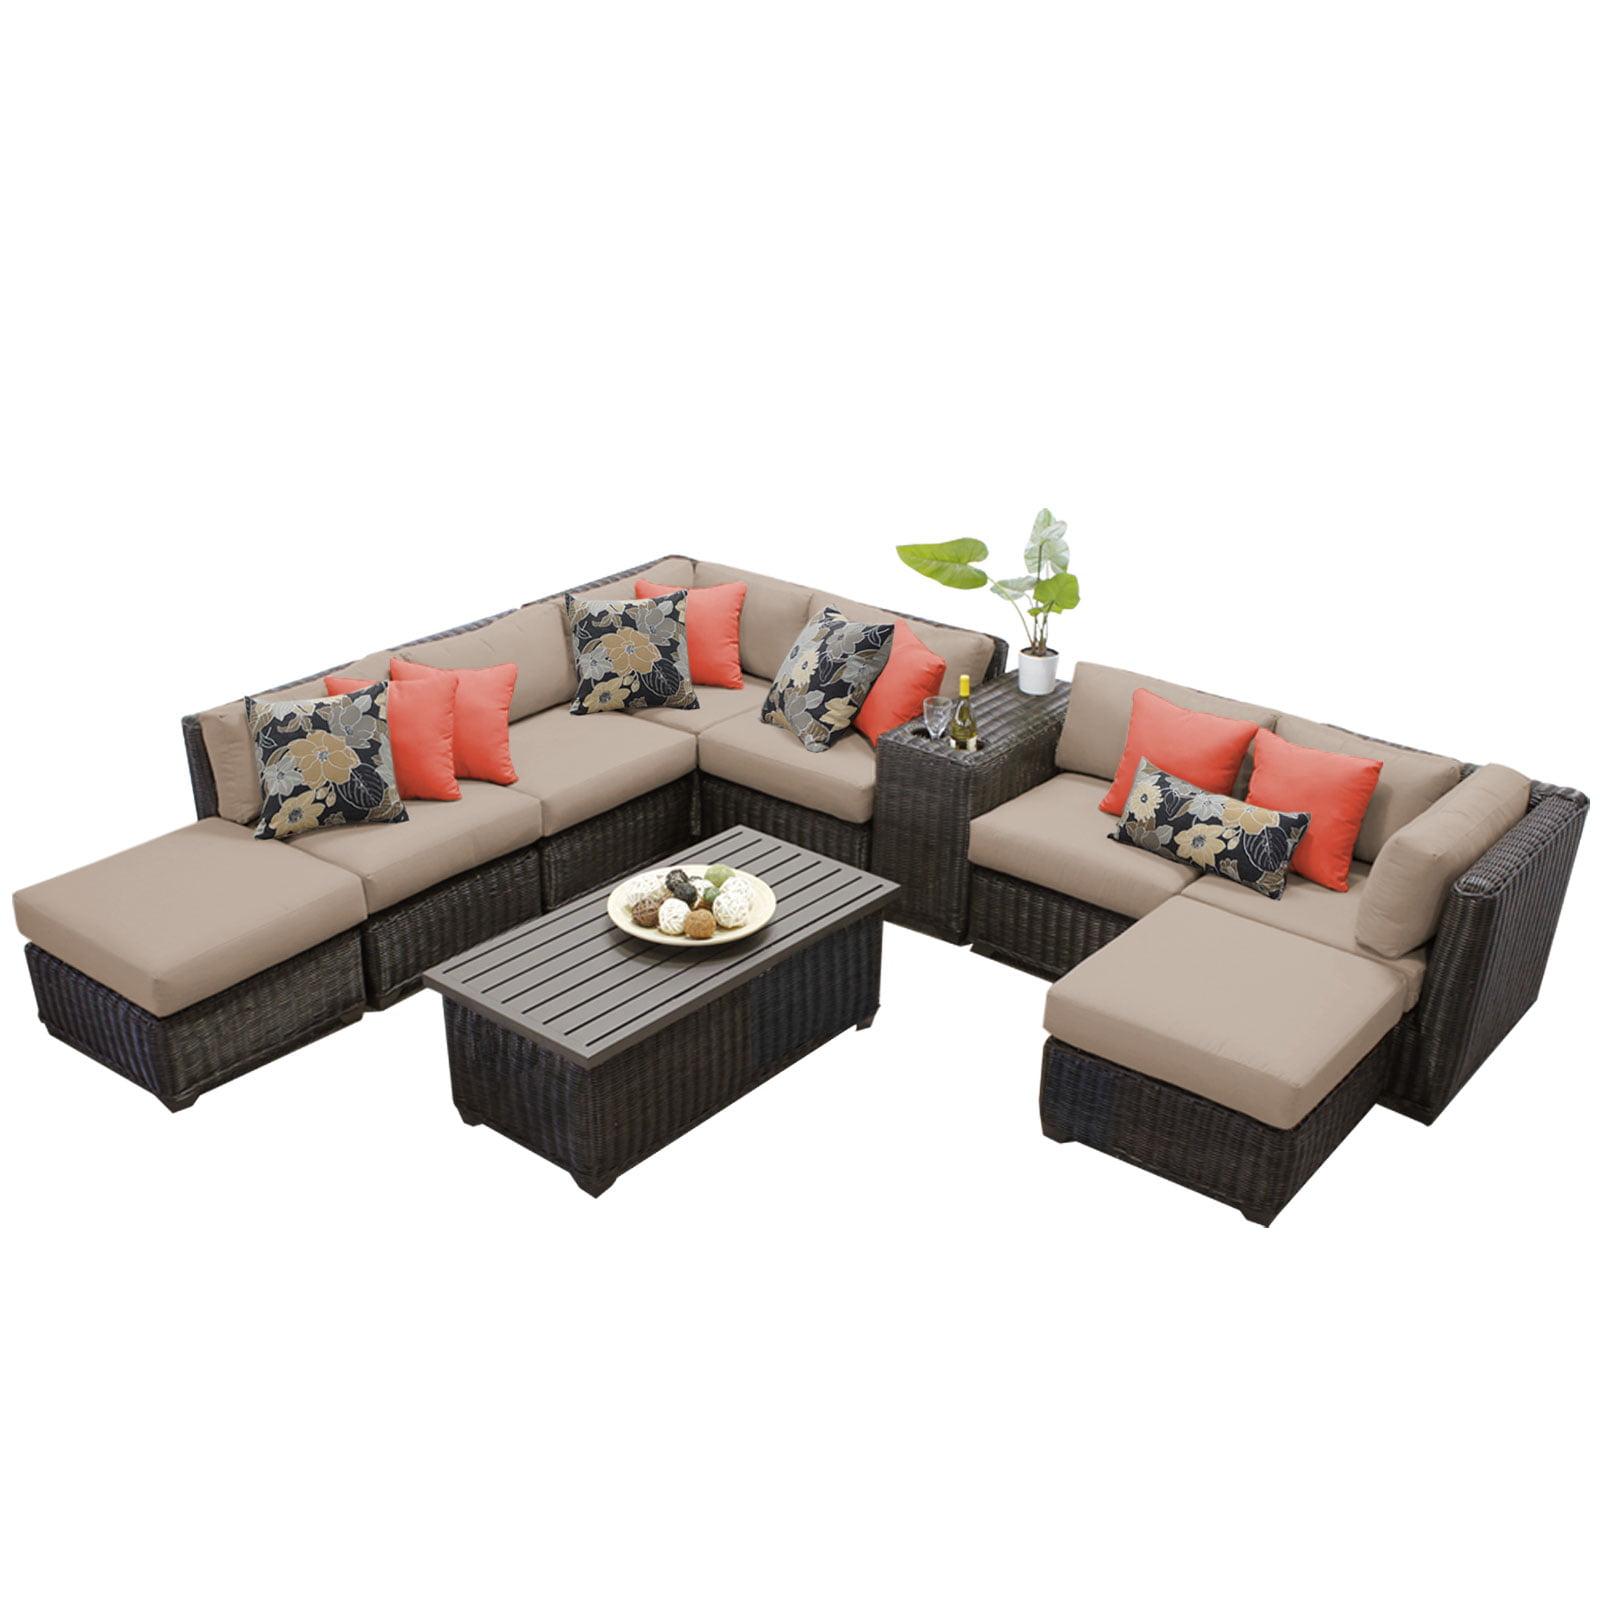 Rustico 10 Piece Outdoor Wicker Patio Furniture Set 10a by TK Classics